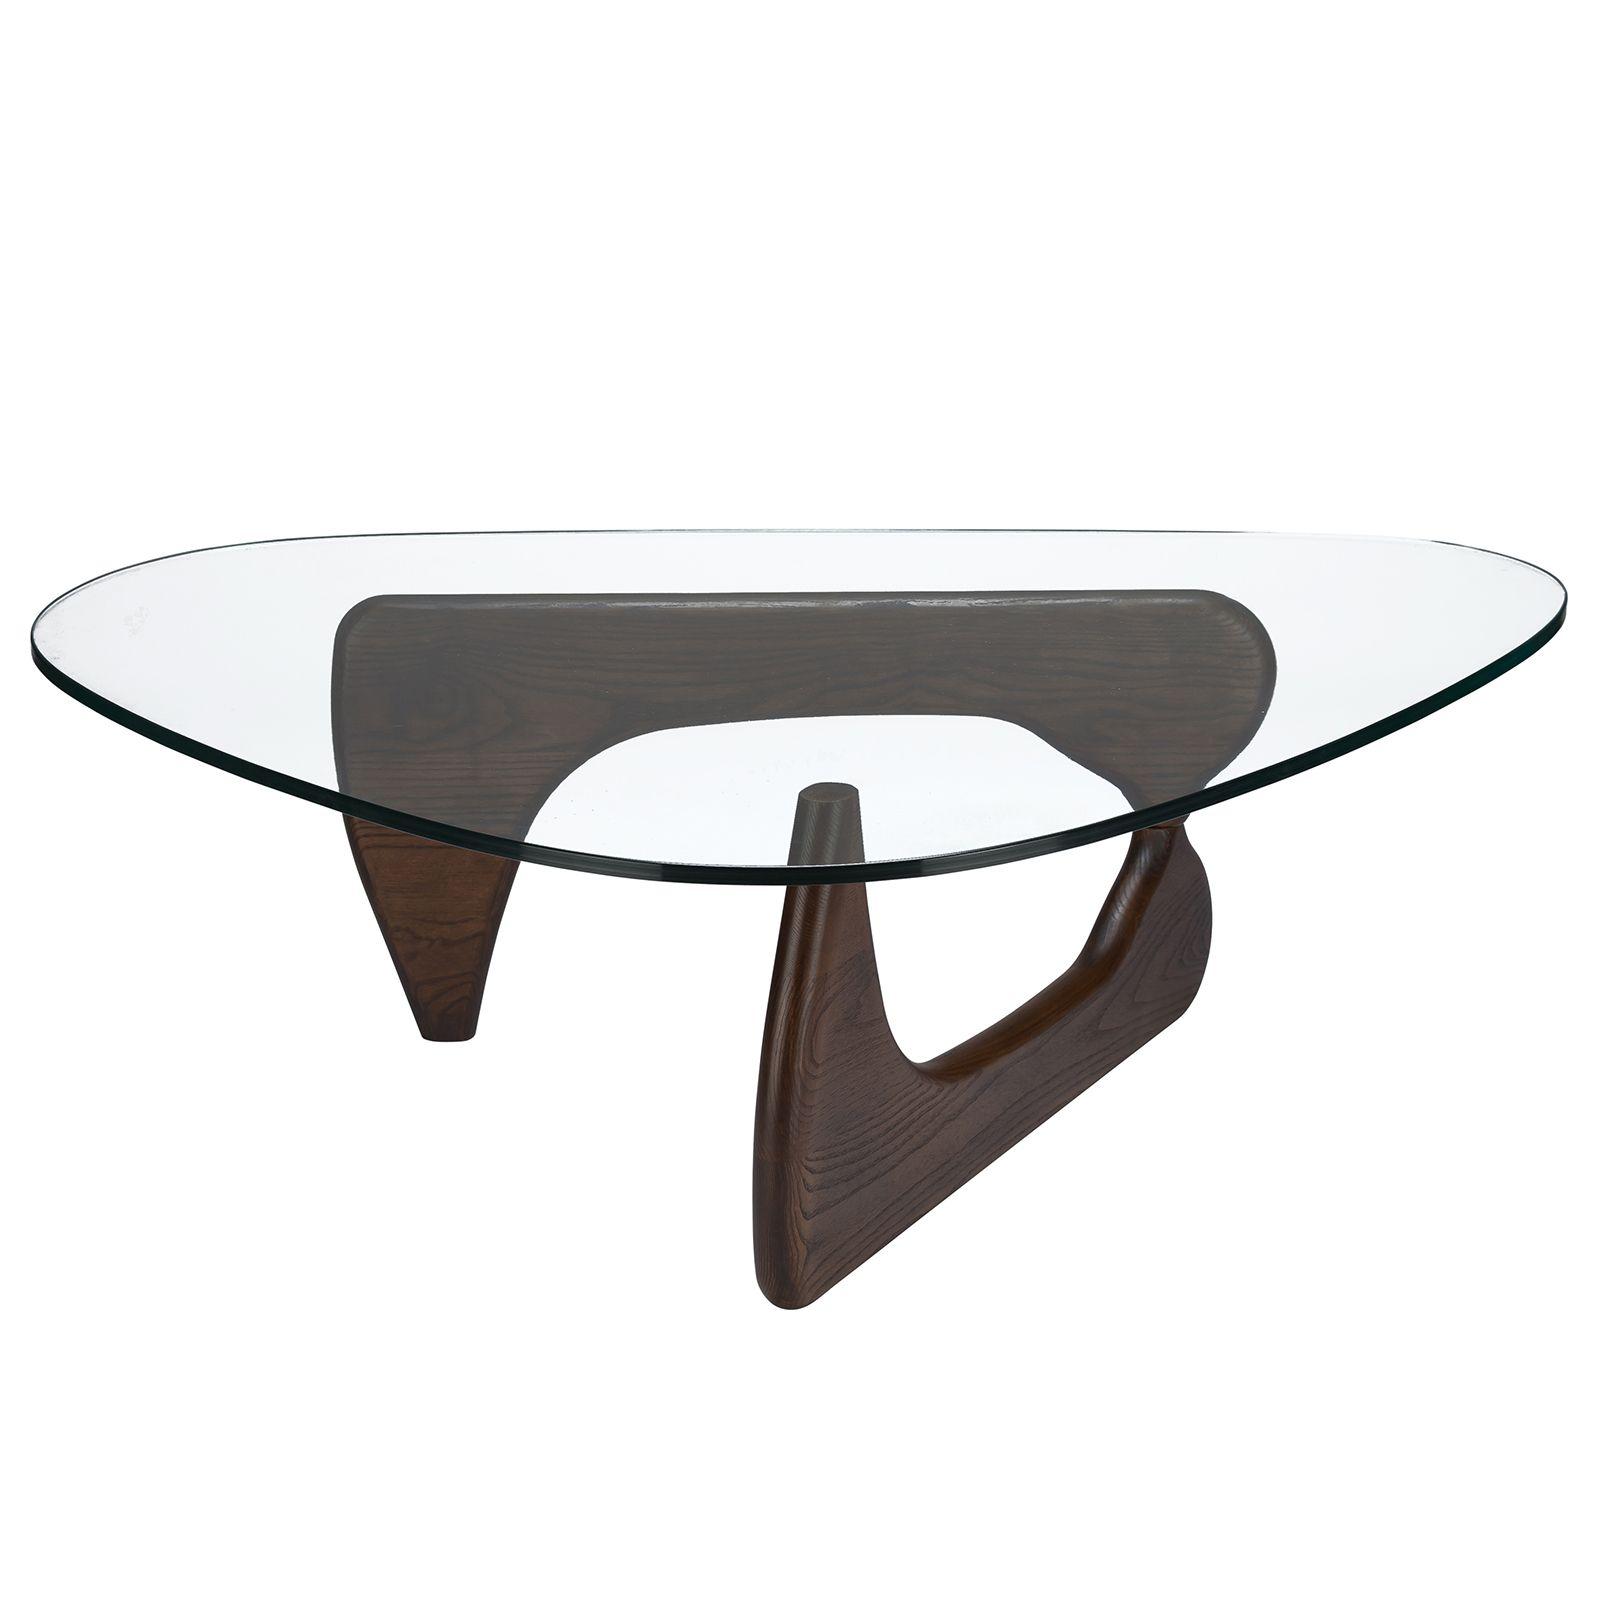 Skulls Coffee Table Decor Furniture Home Decor [ 1937 x 2583 Pixel ]